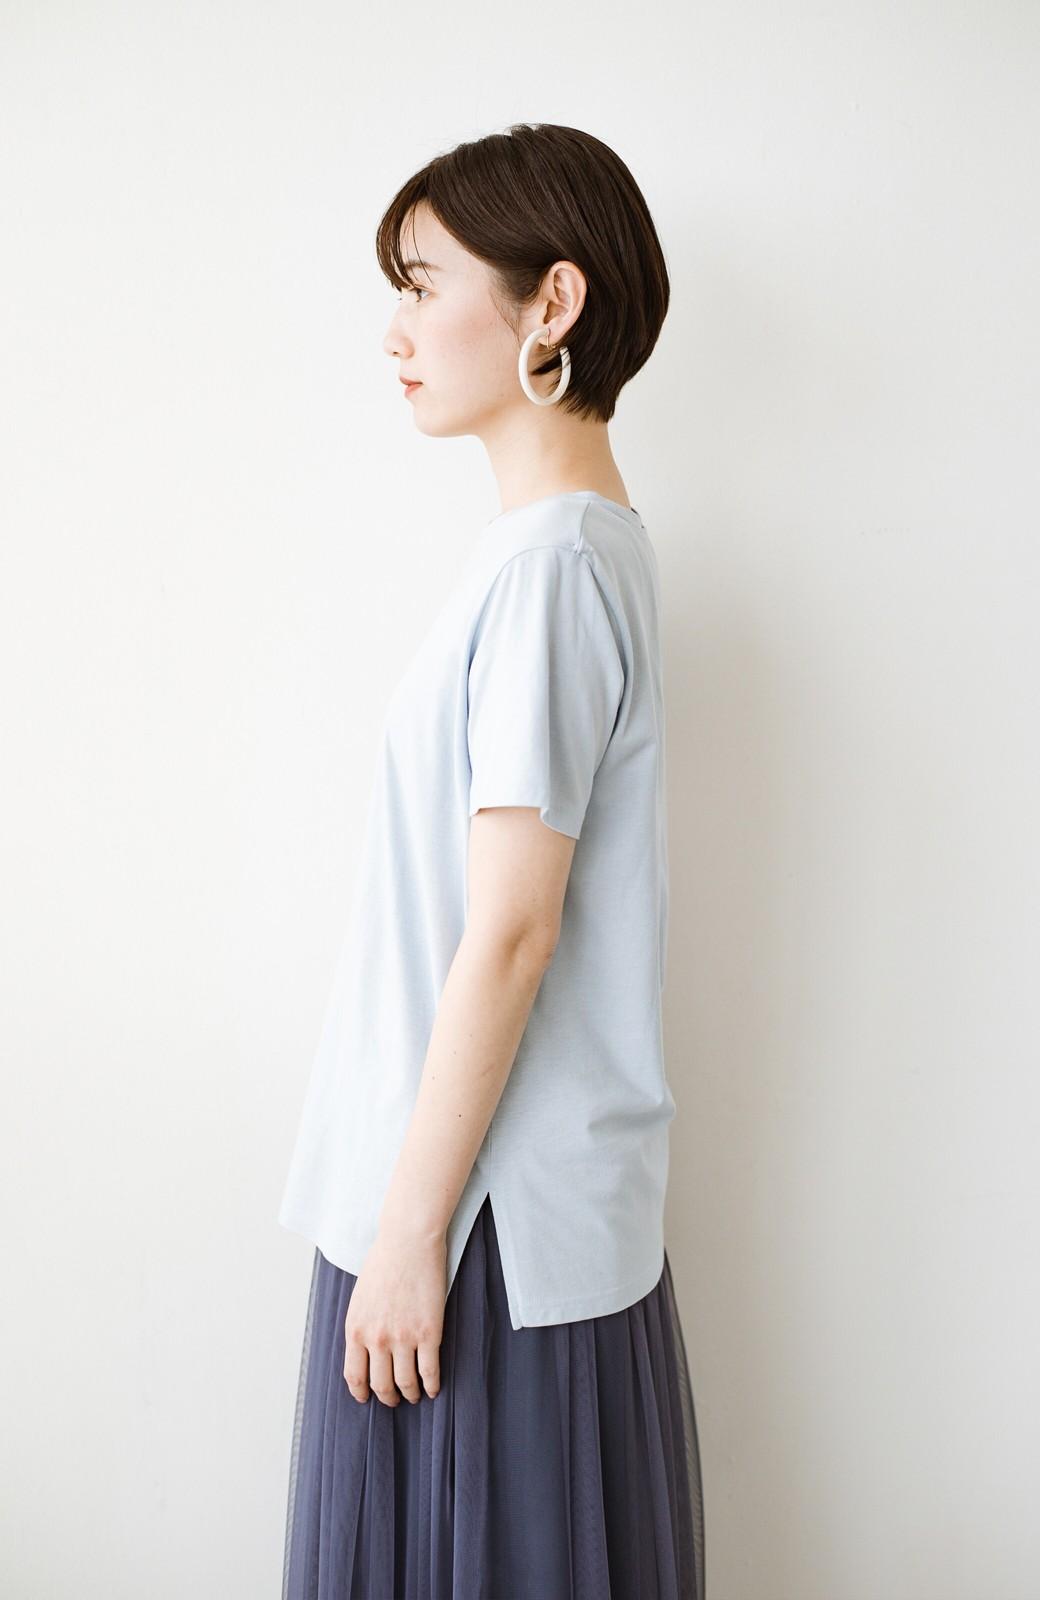 haco! 汗染み軽減加工で安心!1枚でも重ね着にも便利なシンプルTシャツ by ZAMPA <サックスブルー>の商品写真10